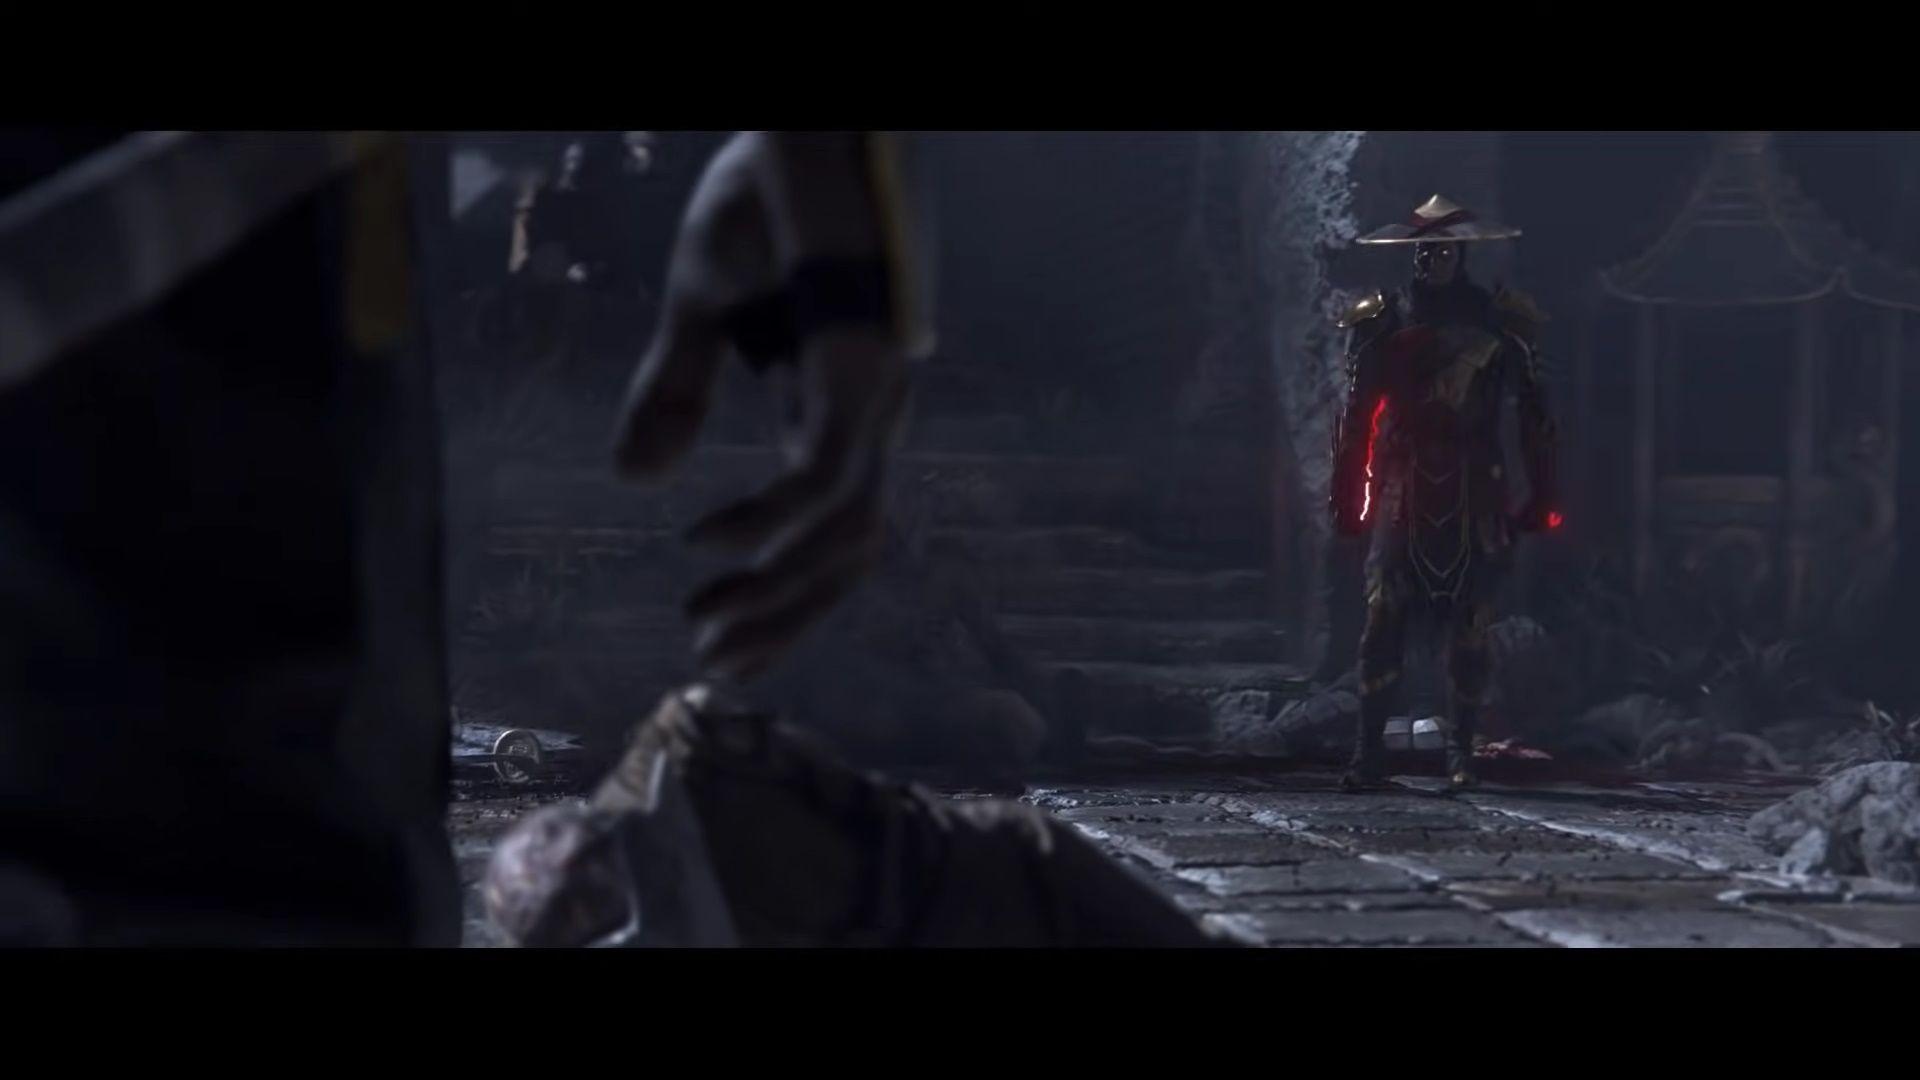 Mortal Kombat 11 Theorycrafting MMORPG